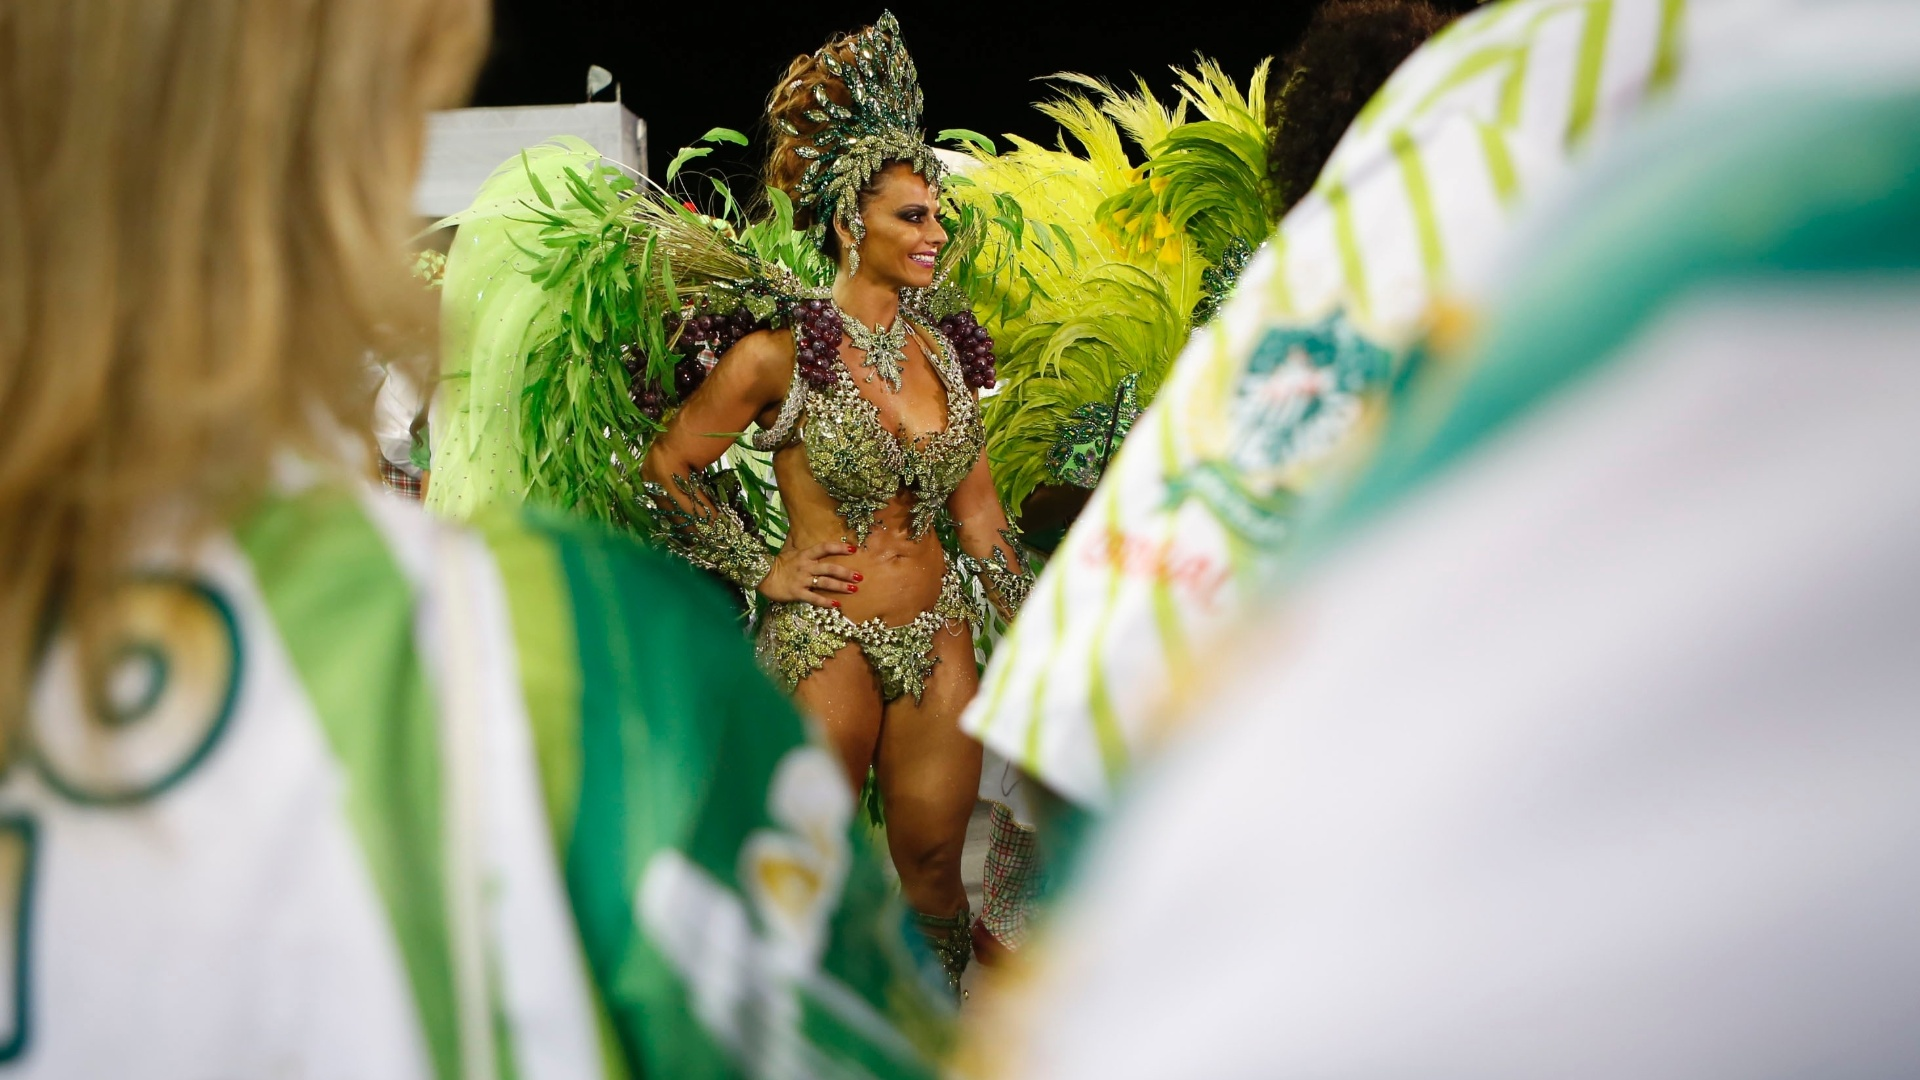 13.fev.2015 - A rainha de bateria da Mancha Verde, Viviane Araújo se prepara para entrar na avenida